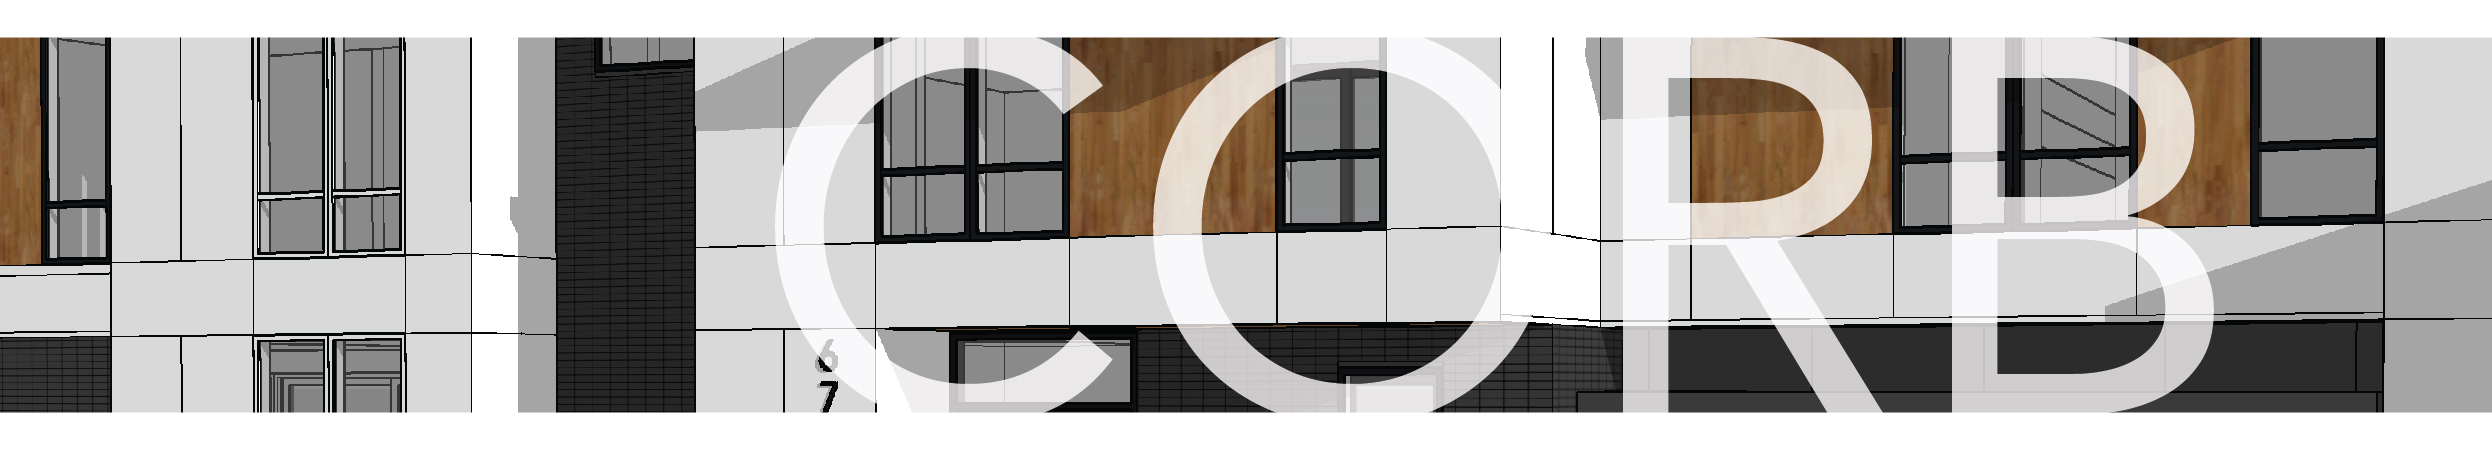 Project Tiles-25.jpg